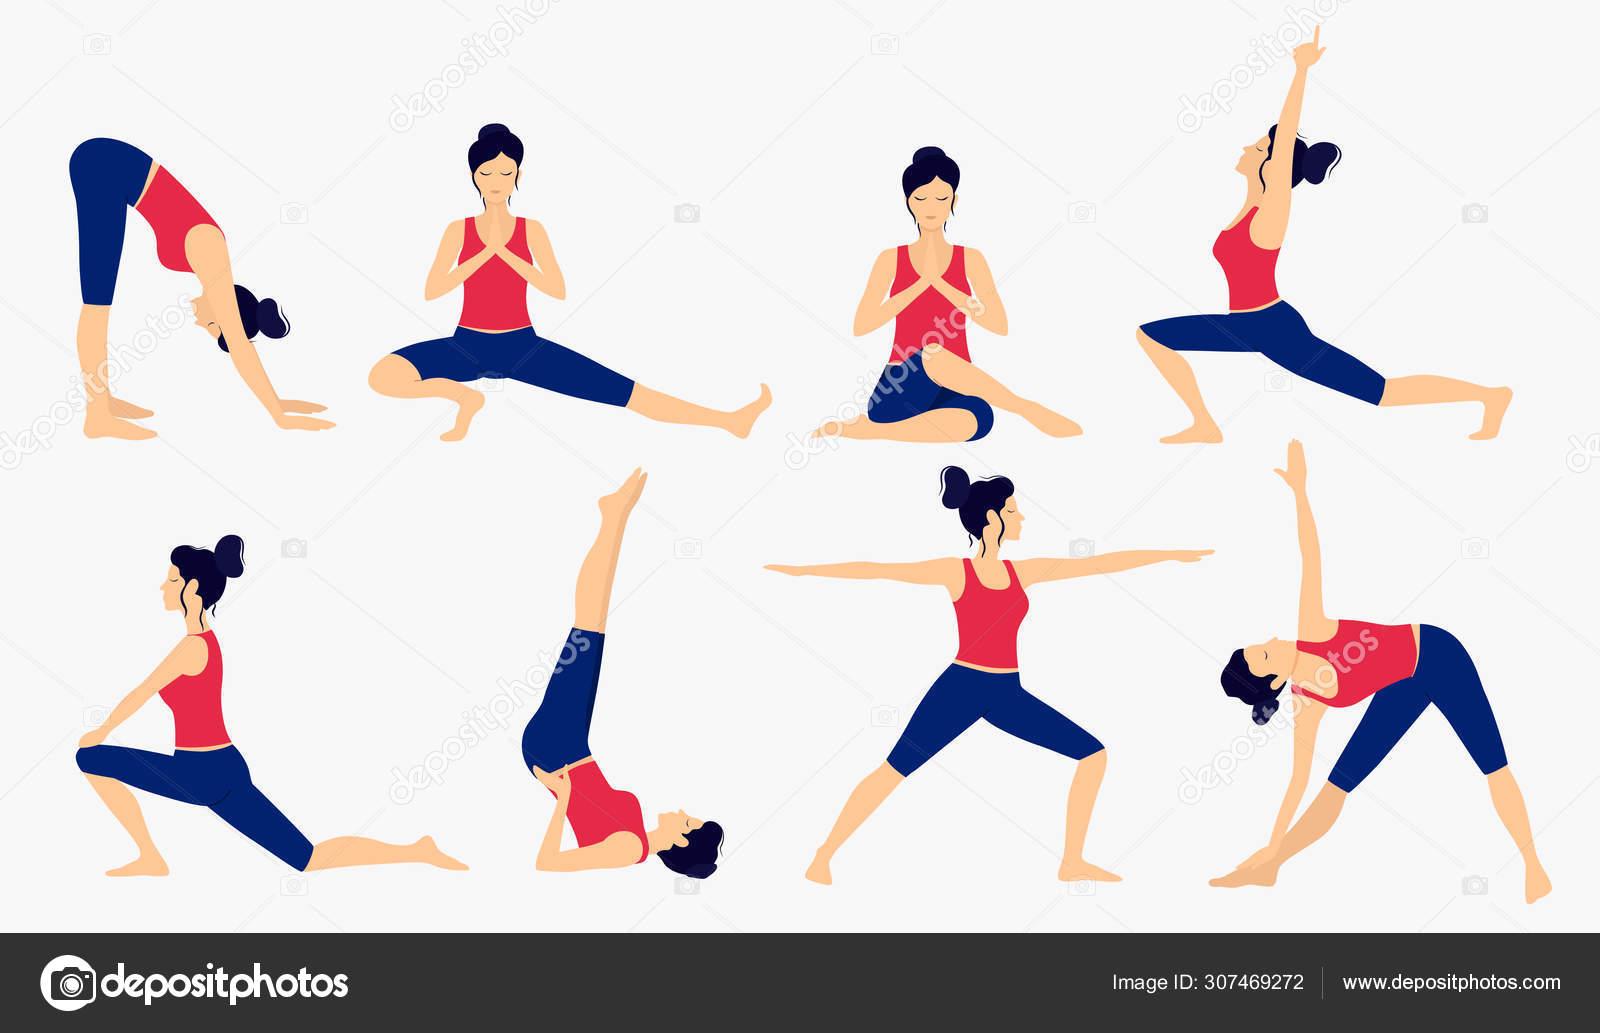 Various Yoga Poses Set Female Yoga Vector Illustration Healthy Lifestyle Stock Vector C Svetlam 307469272